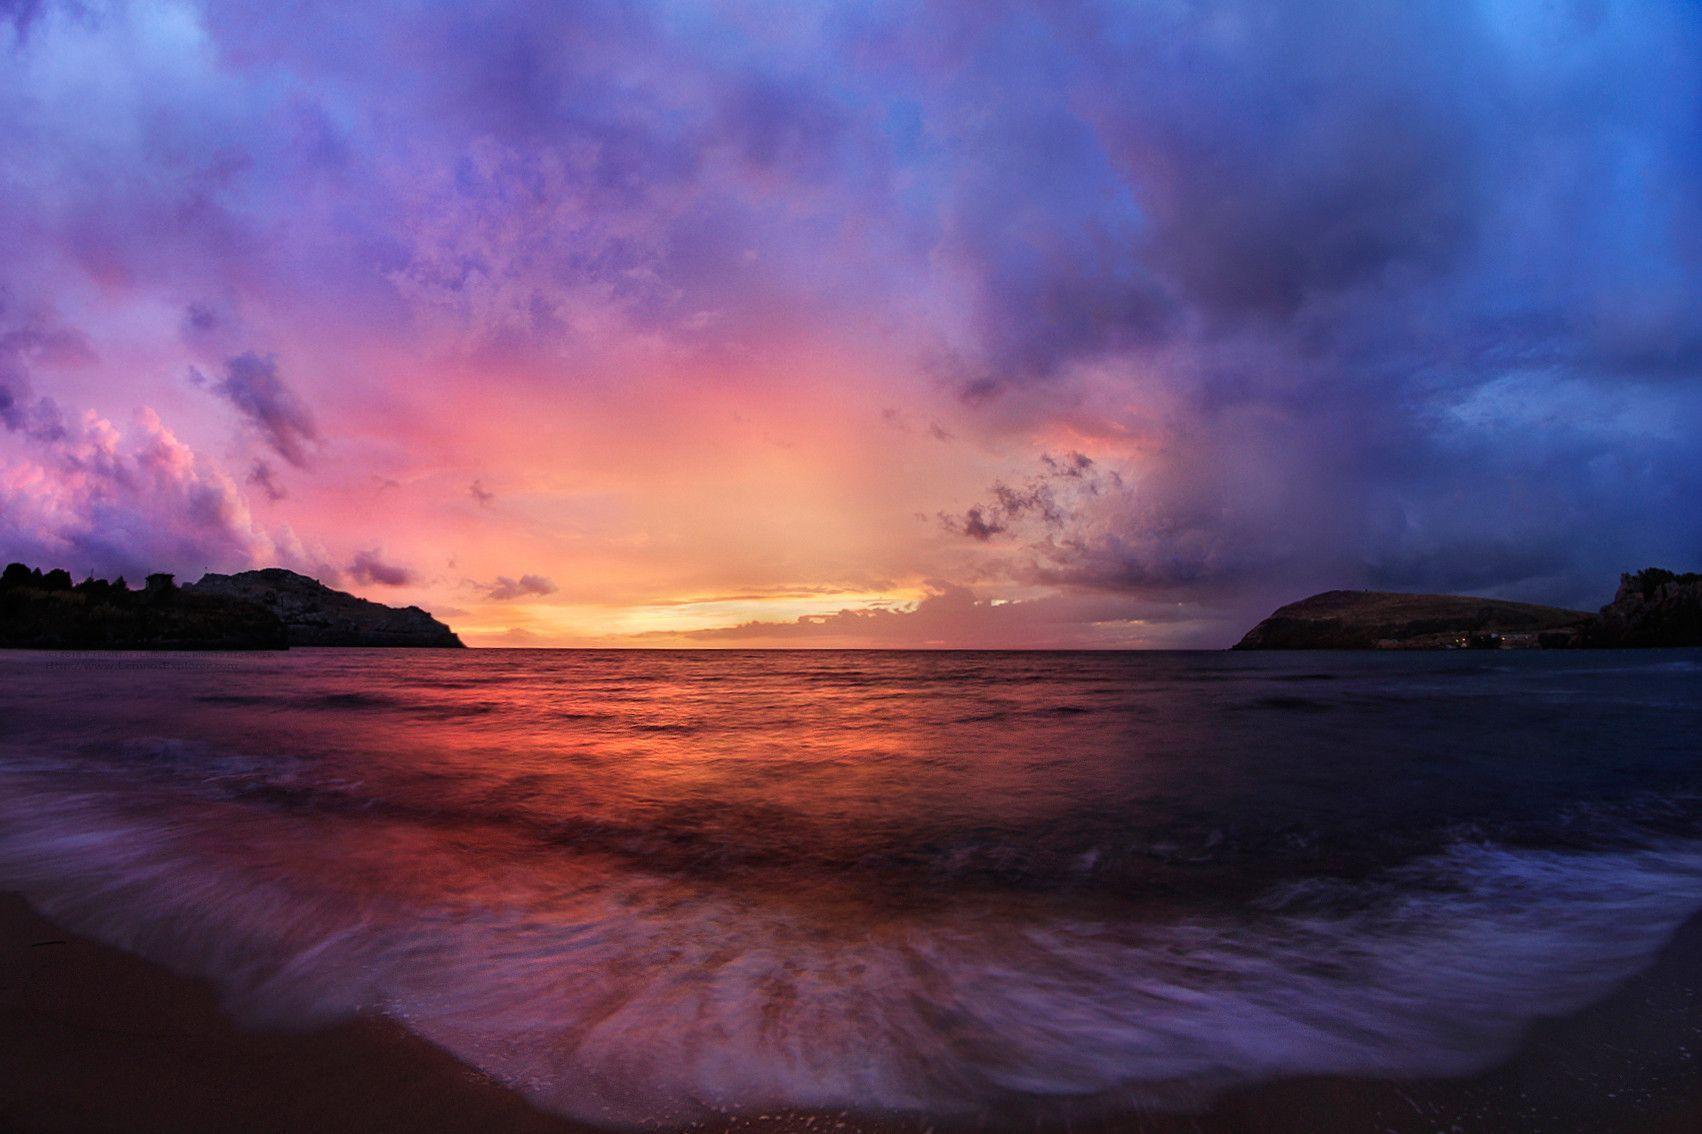 Beach Thunderstorm Wallpaper: Thunderstorms Wallpapers